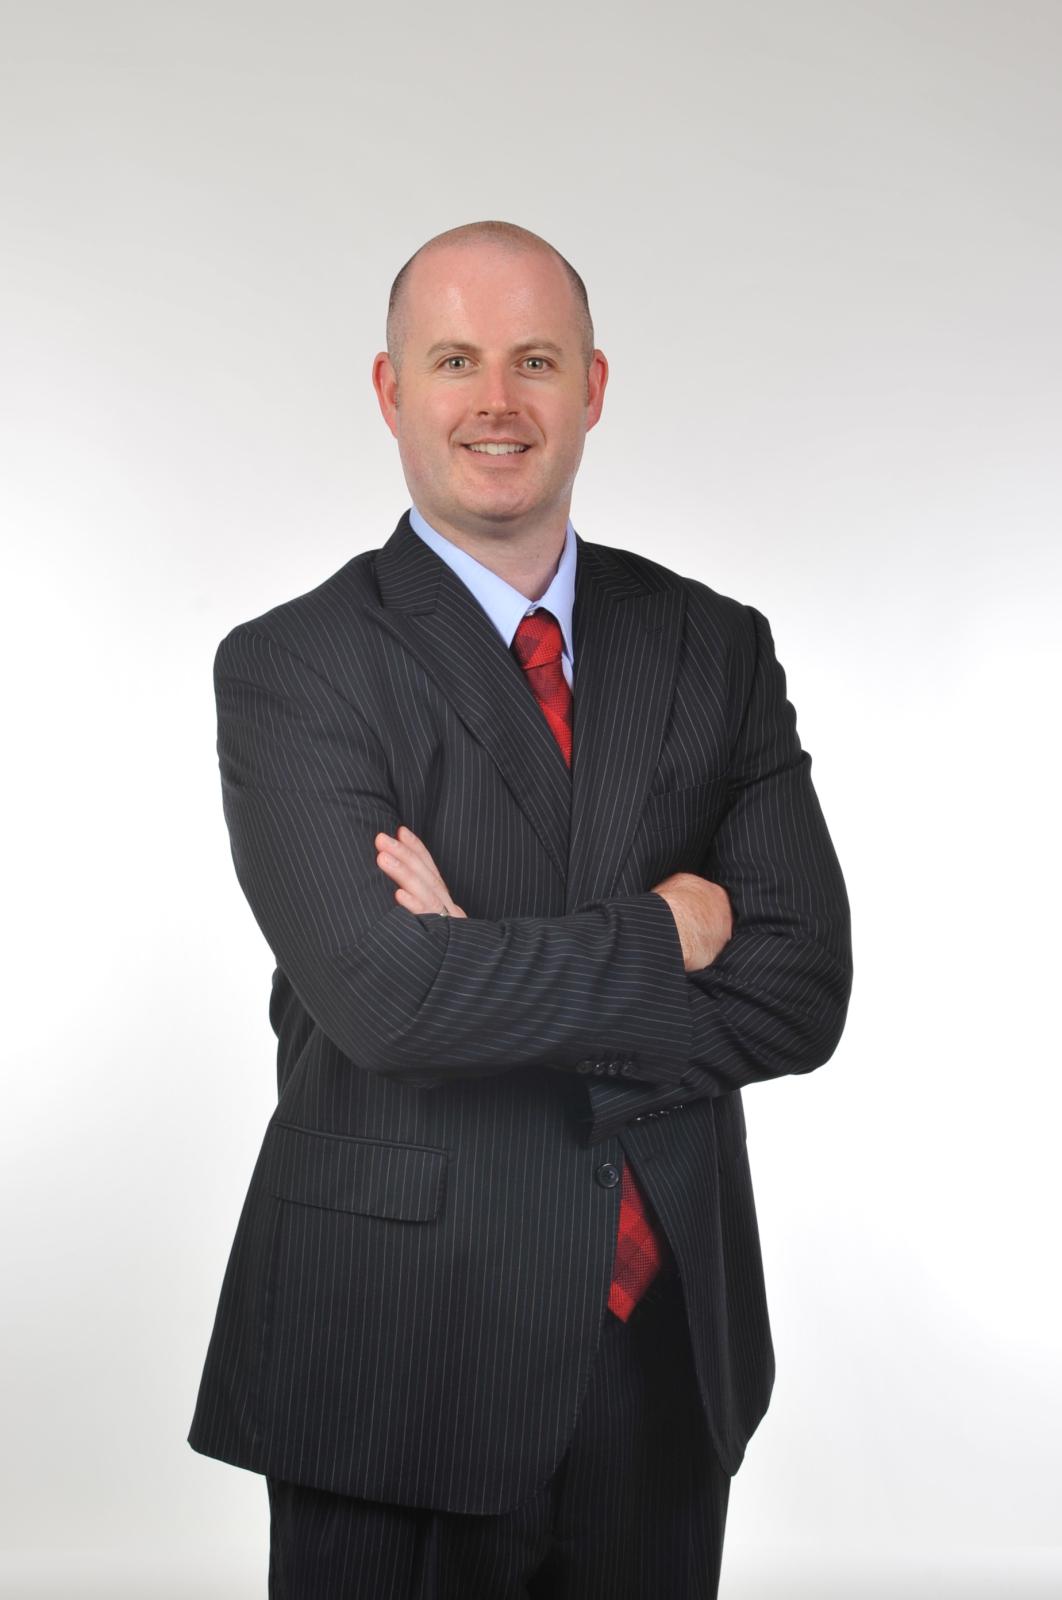 Attorney Michael Cardamone